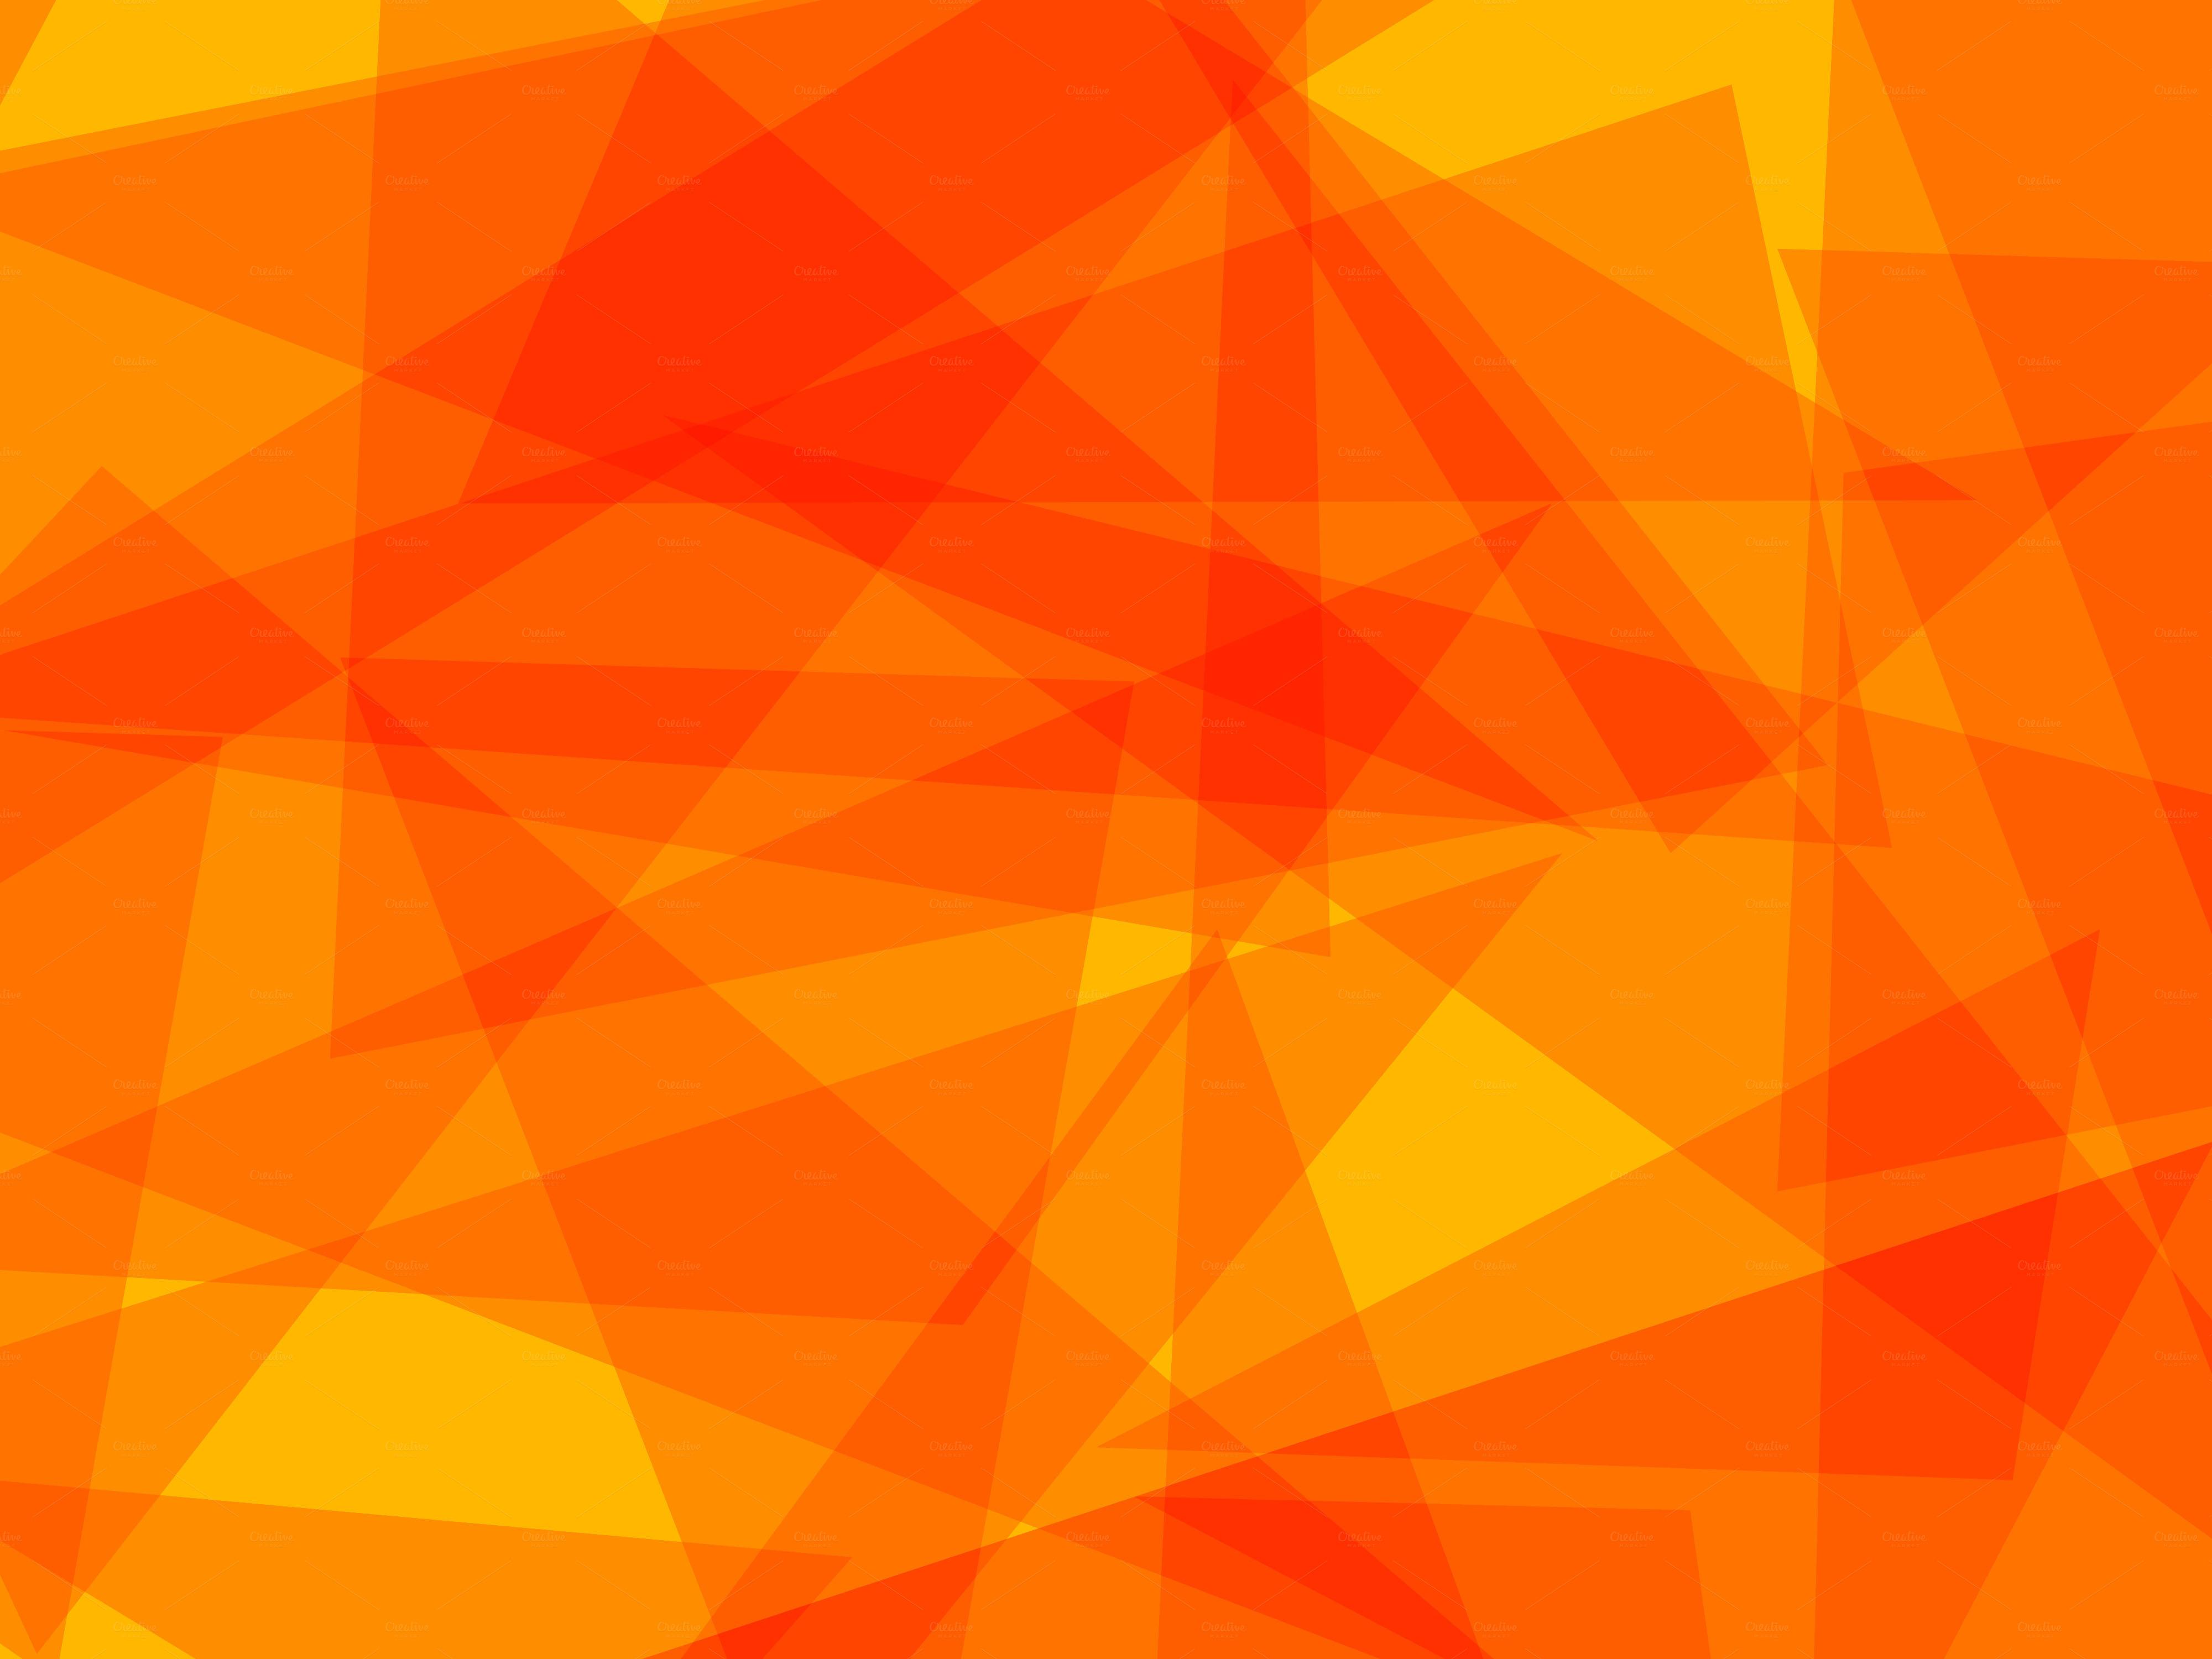 Abstract Orange Triangles Wallpaper 1000 4000x3000   uMadcom 4000x3000